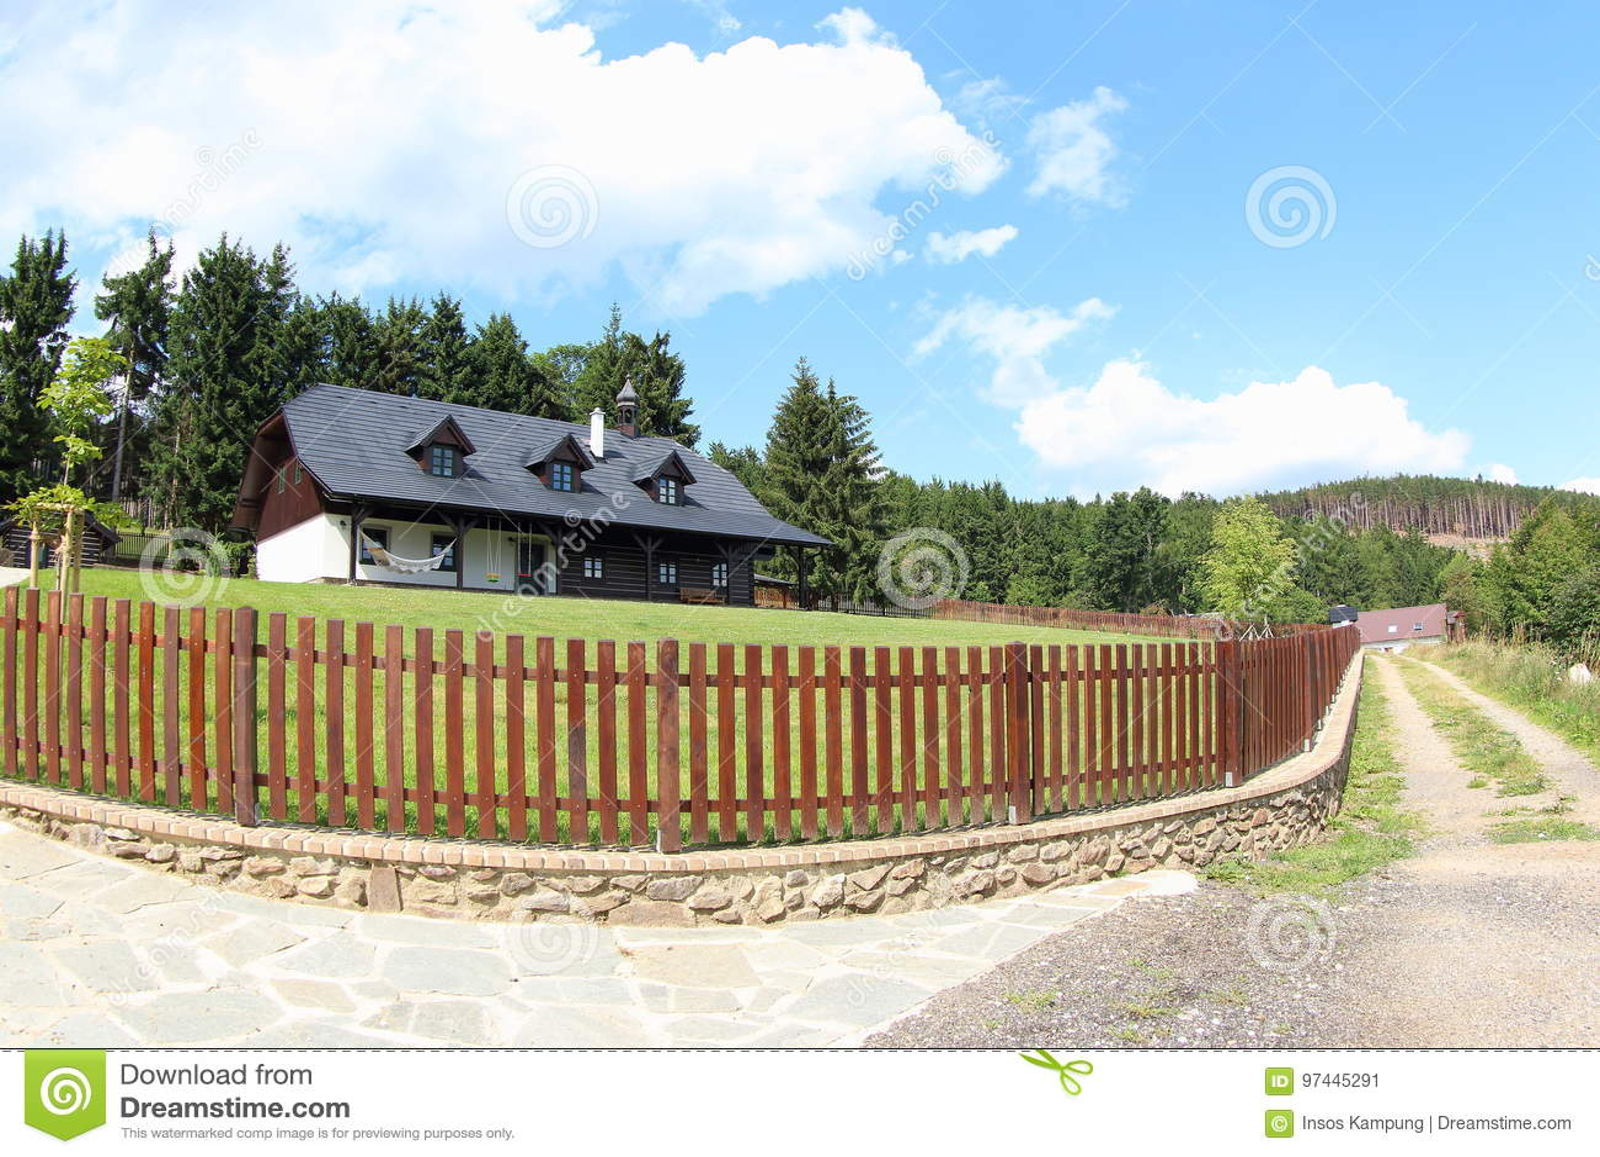 Beautiful Wooden House, Czech Republic